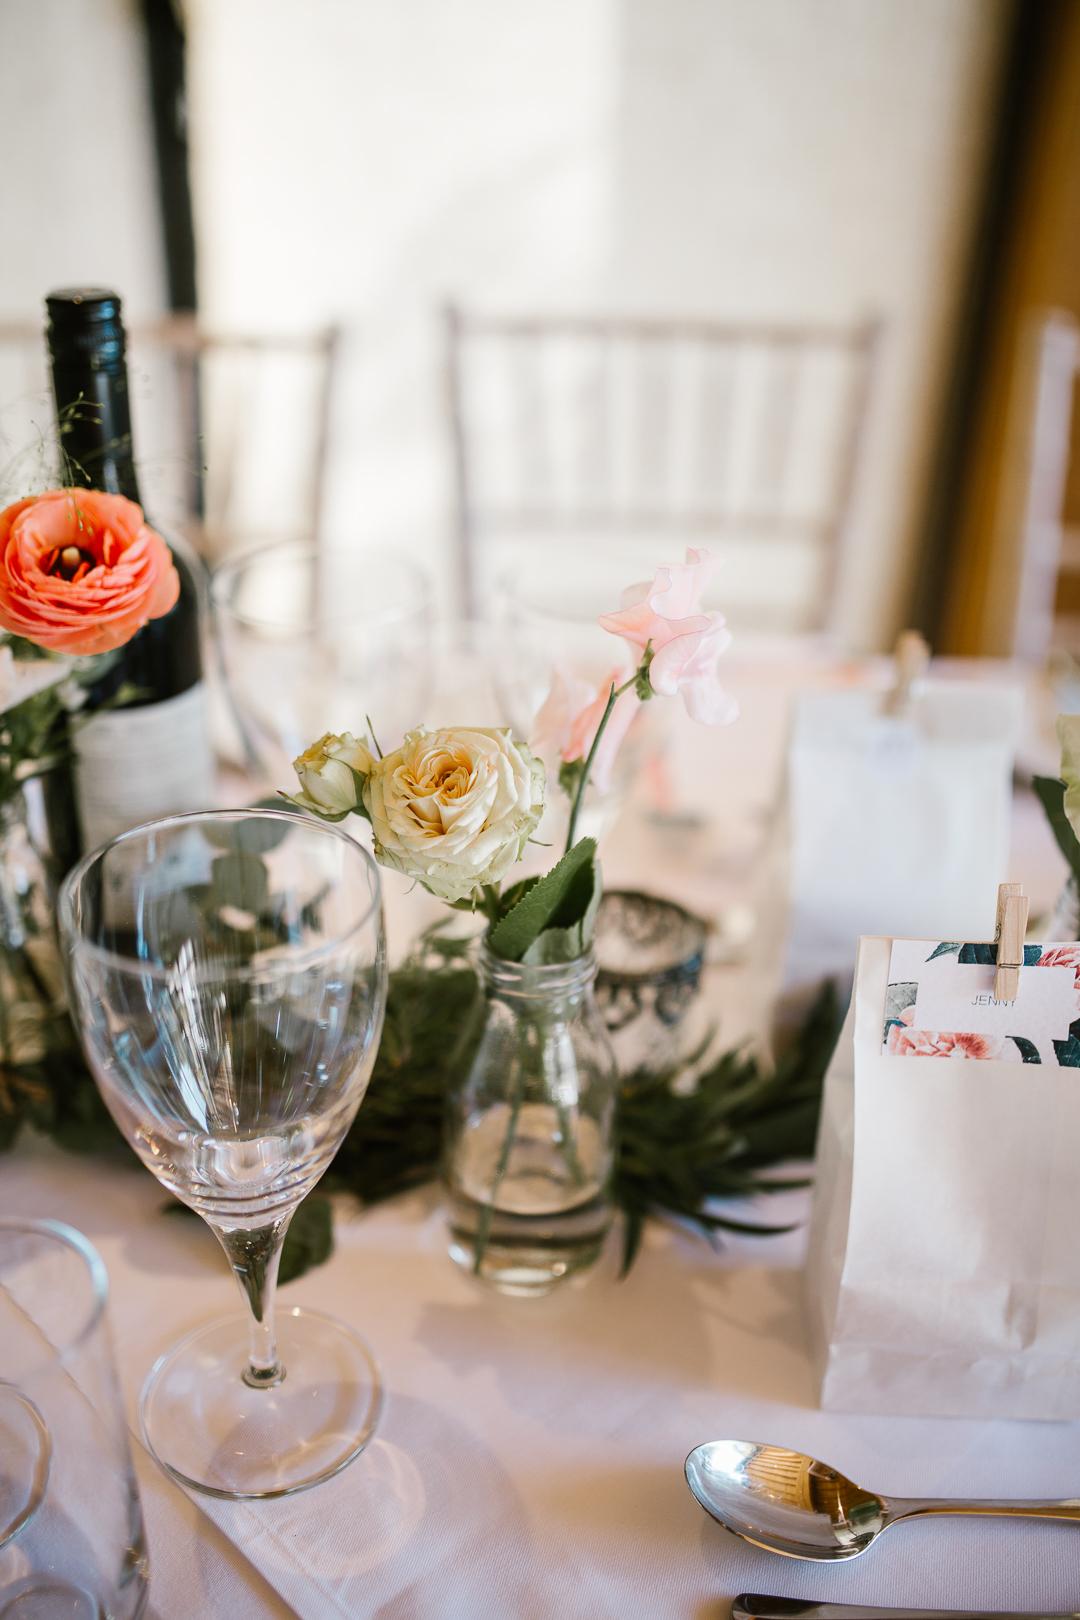 Beth + Will, Chaucer Barns, Chaucer Barns Wedding, Spring Wedding-223.jpg